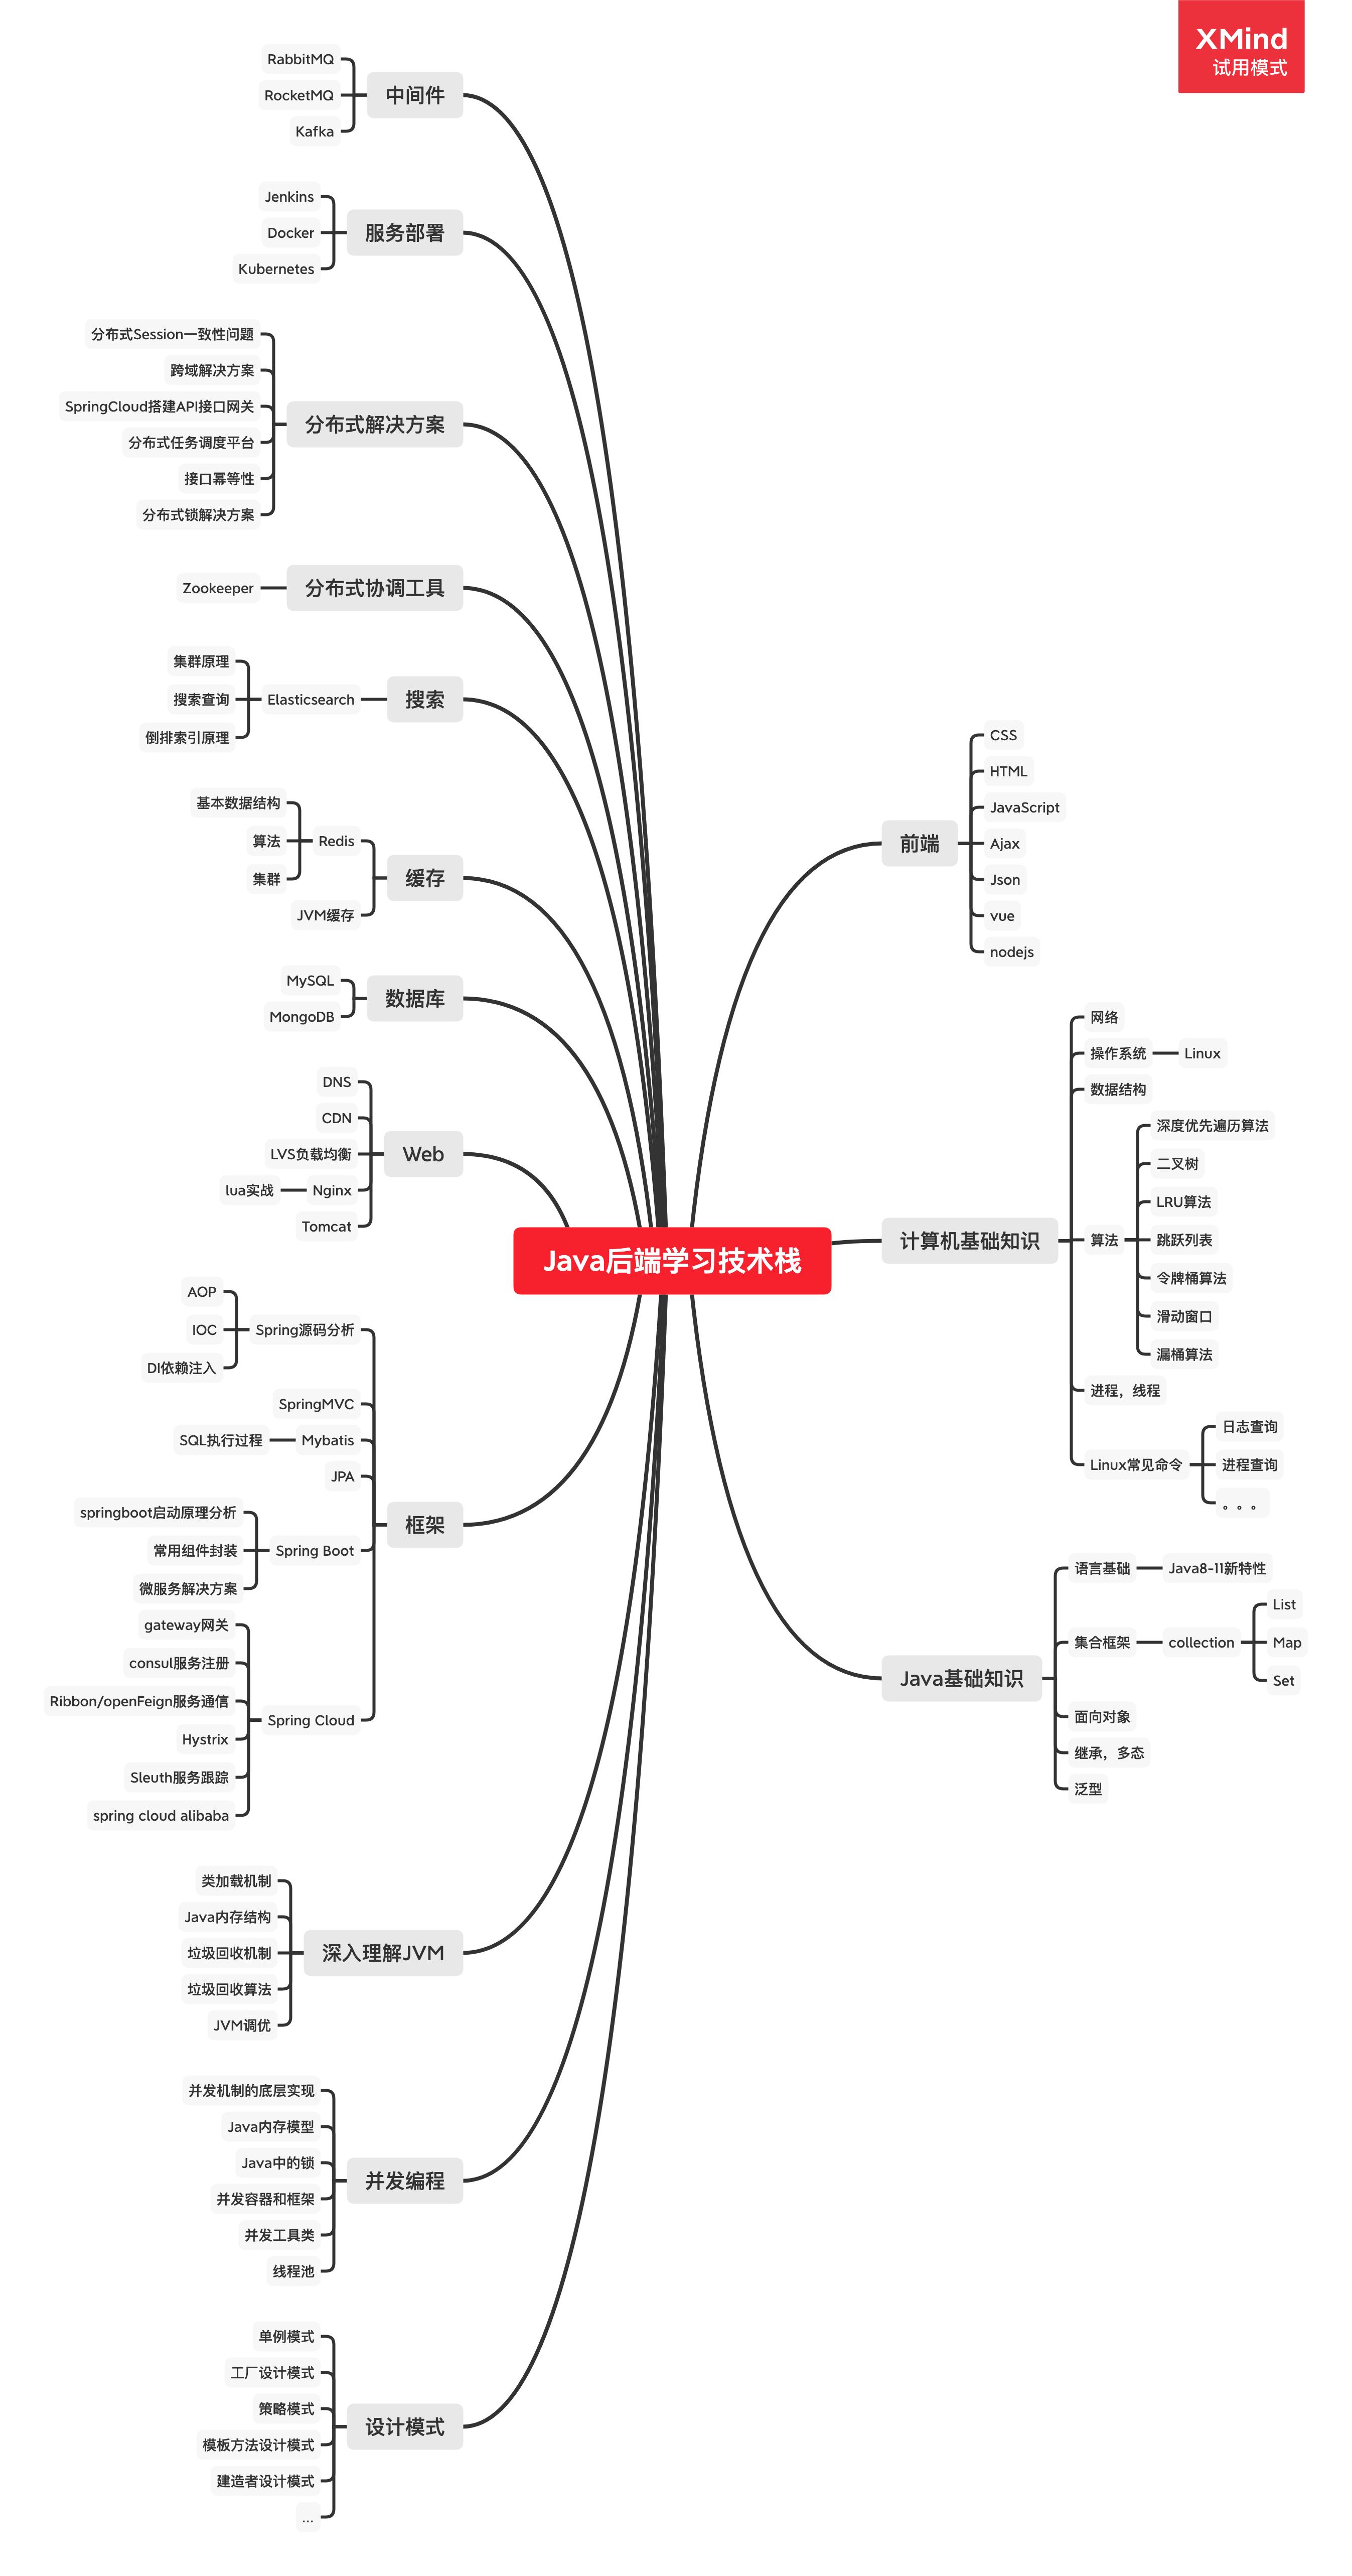 Java后端学习技术栈.png